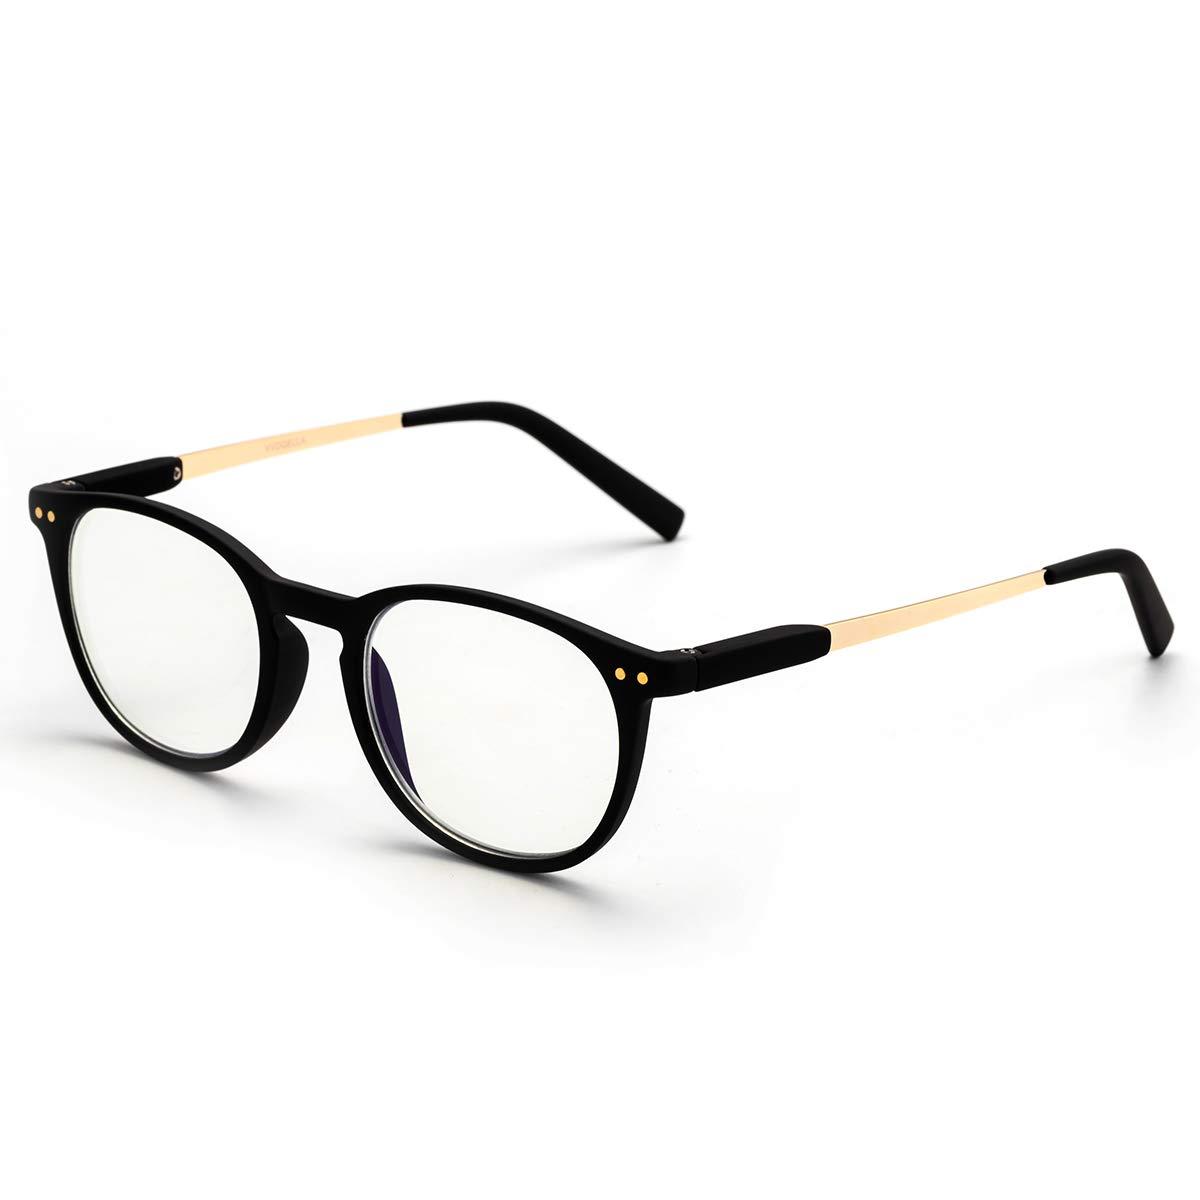 LAURA FAIRY Blue Light Blocking Reading Glasses for Women and Men, 1.5 Computer Reading Glasses with Spring Hinge TR90 Lightweight Frame UV Protection Anti Glare Eyestrain Reader (Black,1.5D)